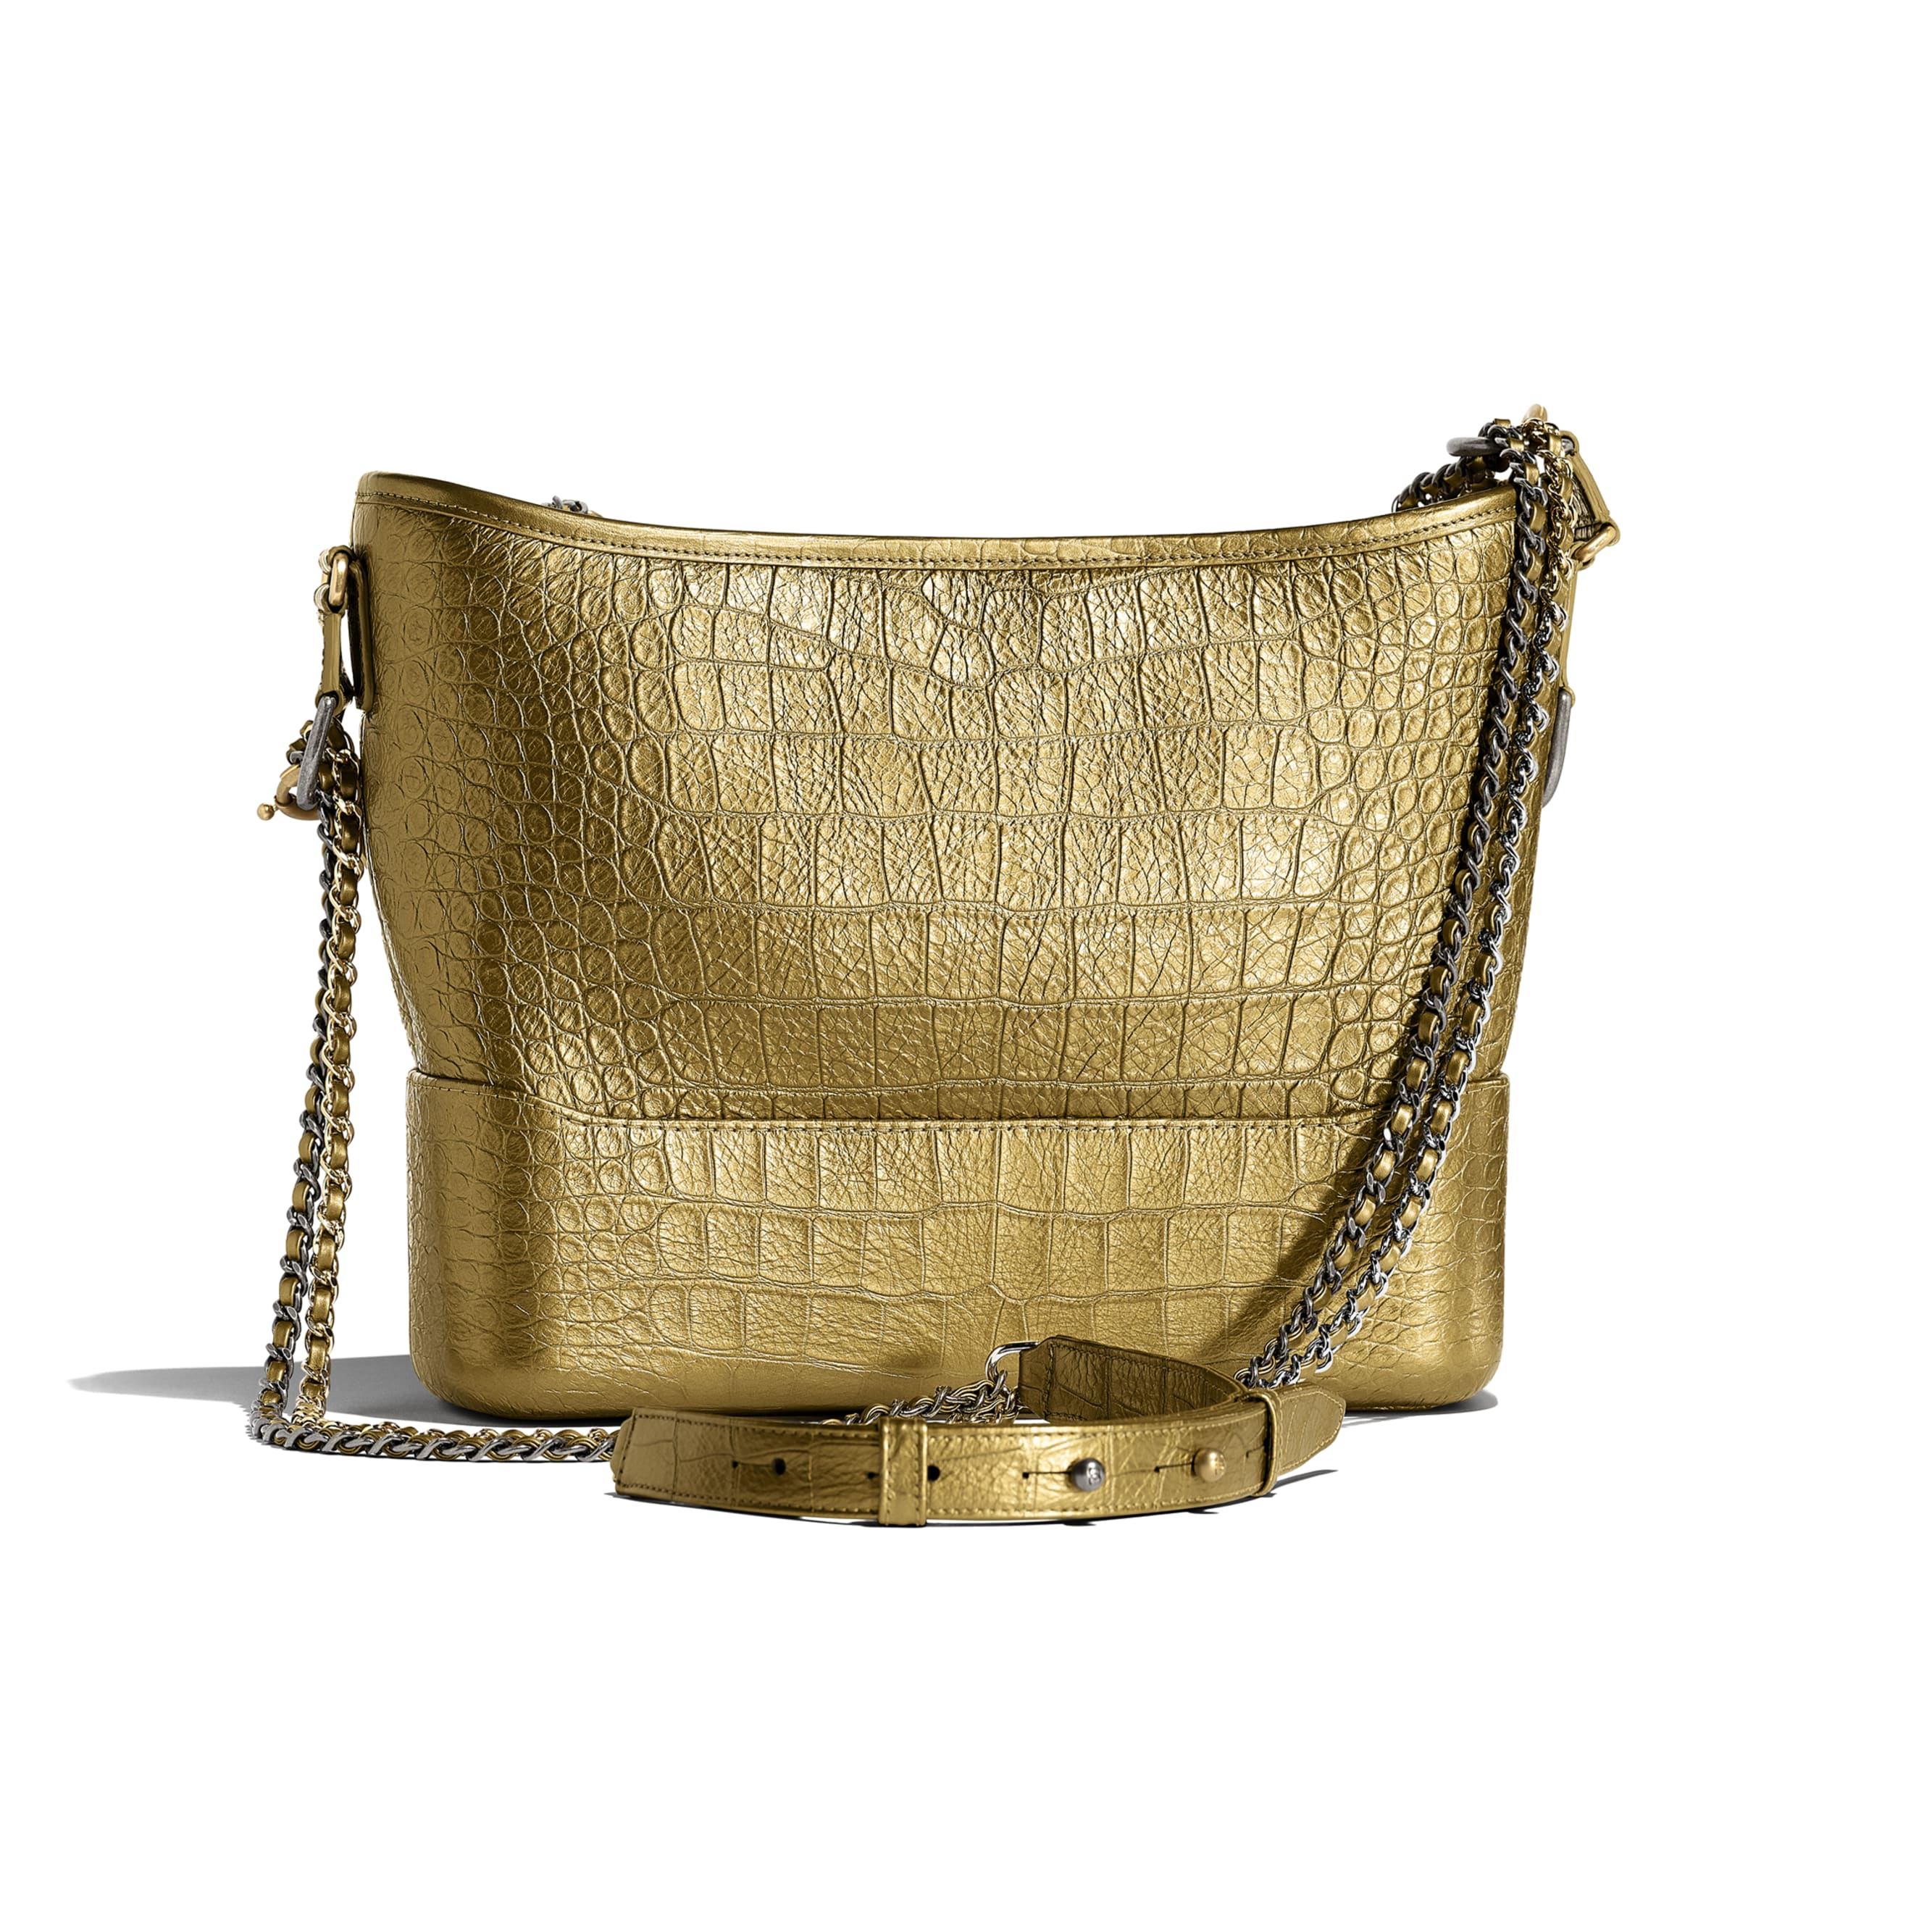 CHANEL'S GABRIELLE Hobo Bag - Gold - Metallic Crocodile Embossed Calfskin, Gold-Tone & Silver-Tone Metal - Alternative view - see standard sized version